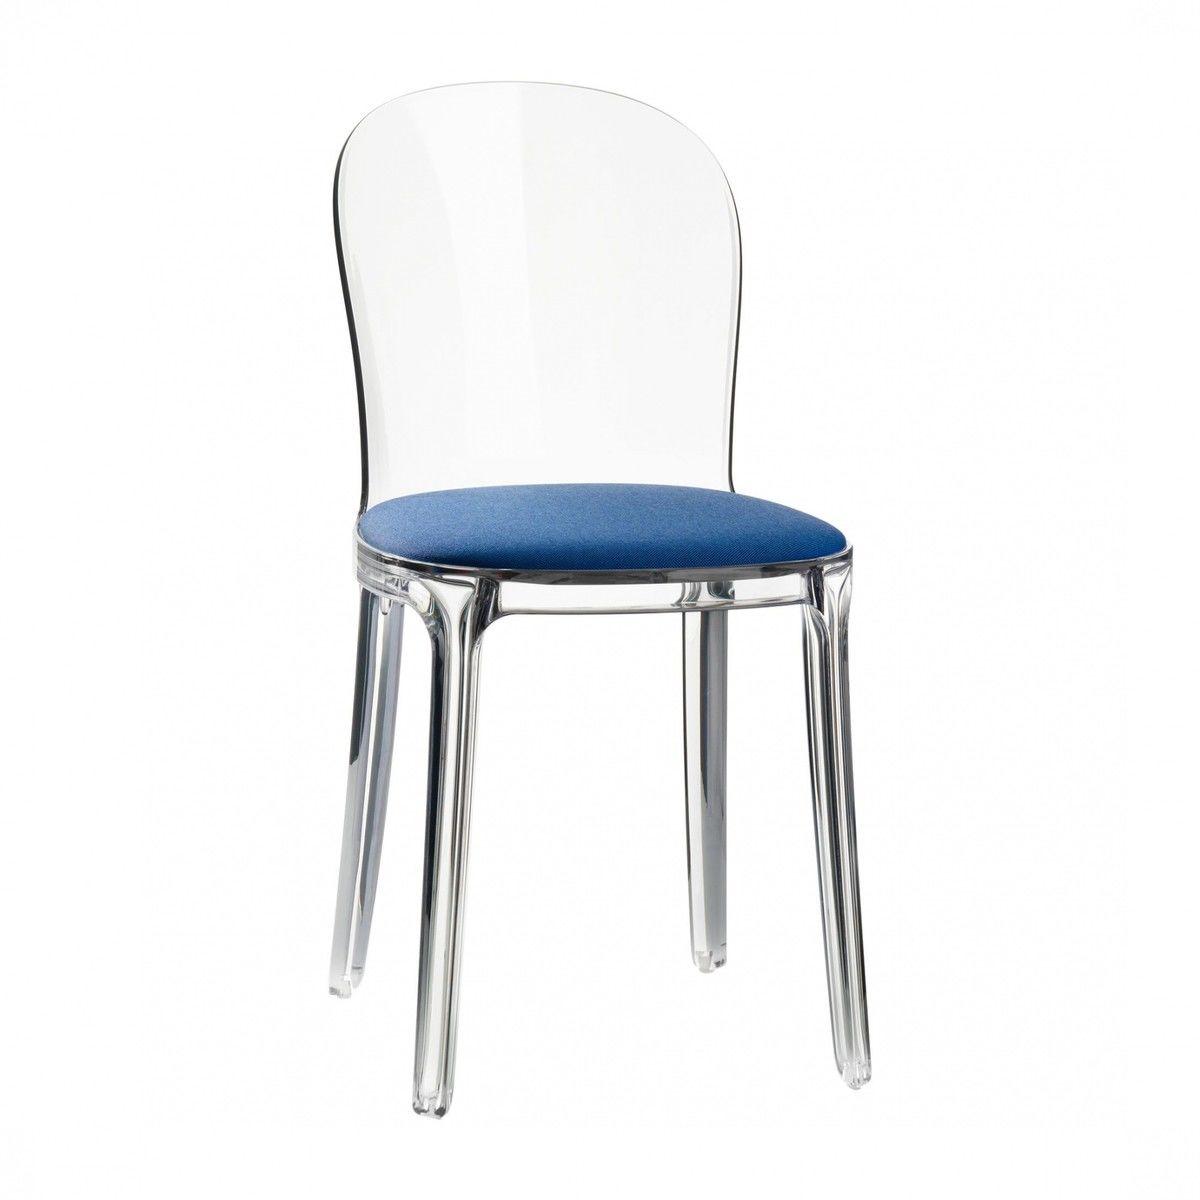 Vanity chair transparent magis for Magis chair